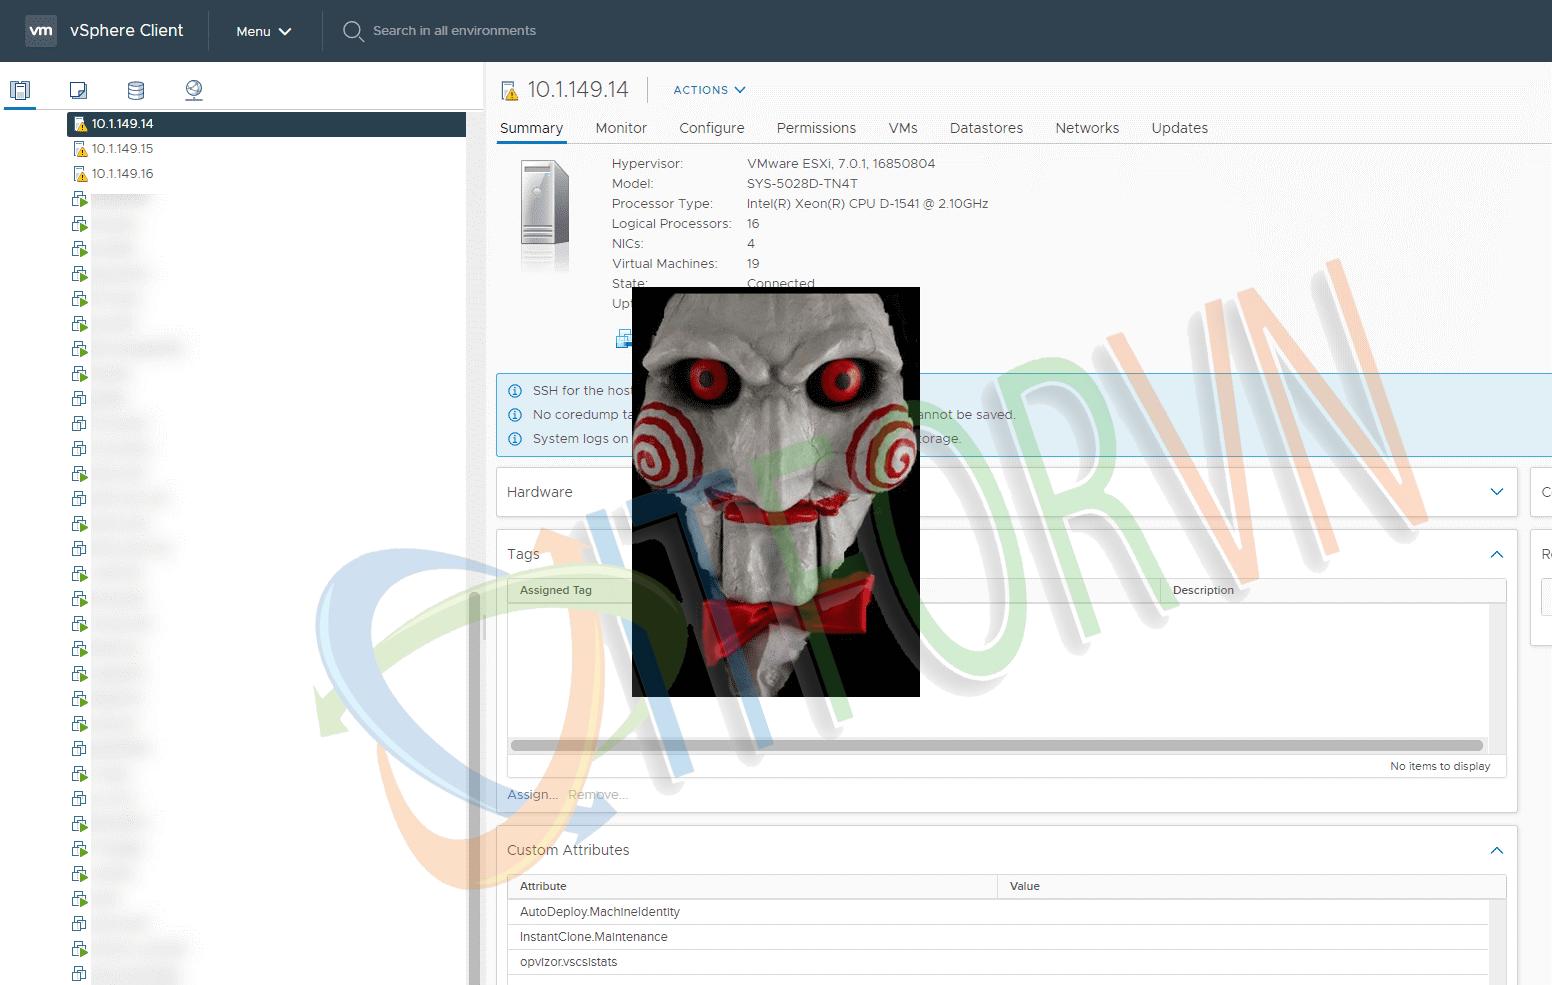 ITFORVN.COM 1.1 RANSOMWARE VÀ NHỮNG NGUY HẠI ĐỐI VỚI ESXi SERVER Ransomware ESXi SERVER ESXi Ransomware ESXi